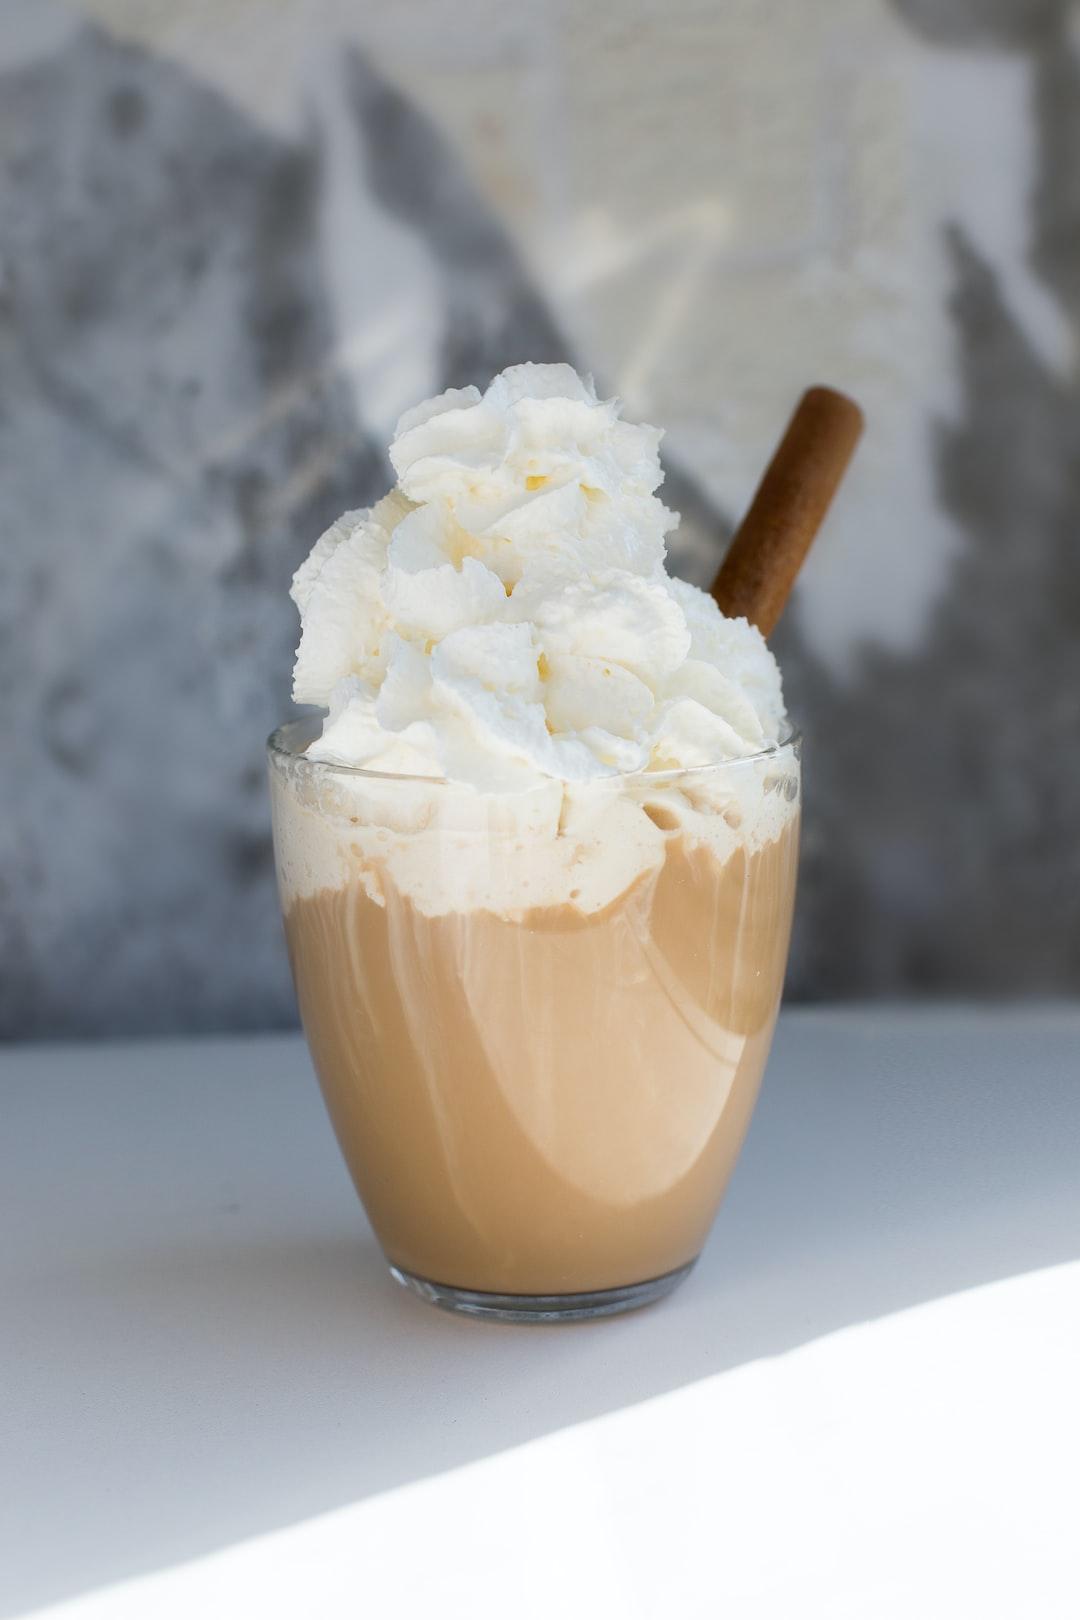 Coffee, cream, and cinnamon